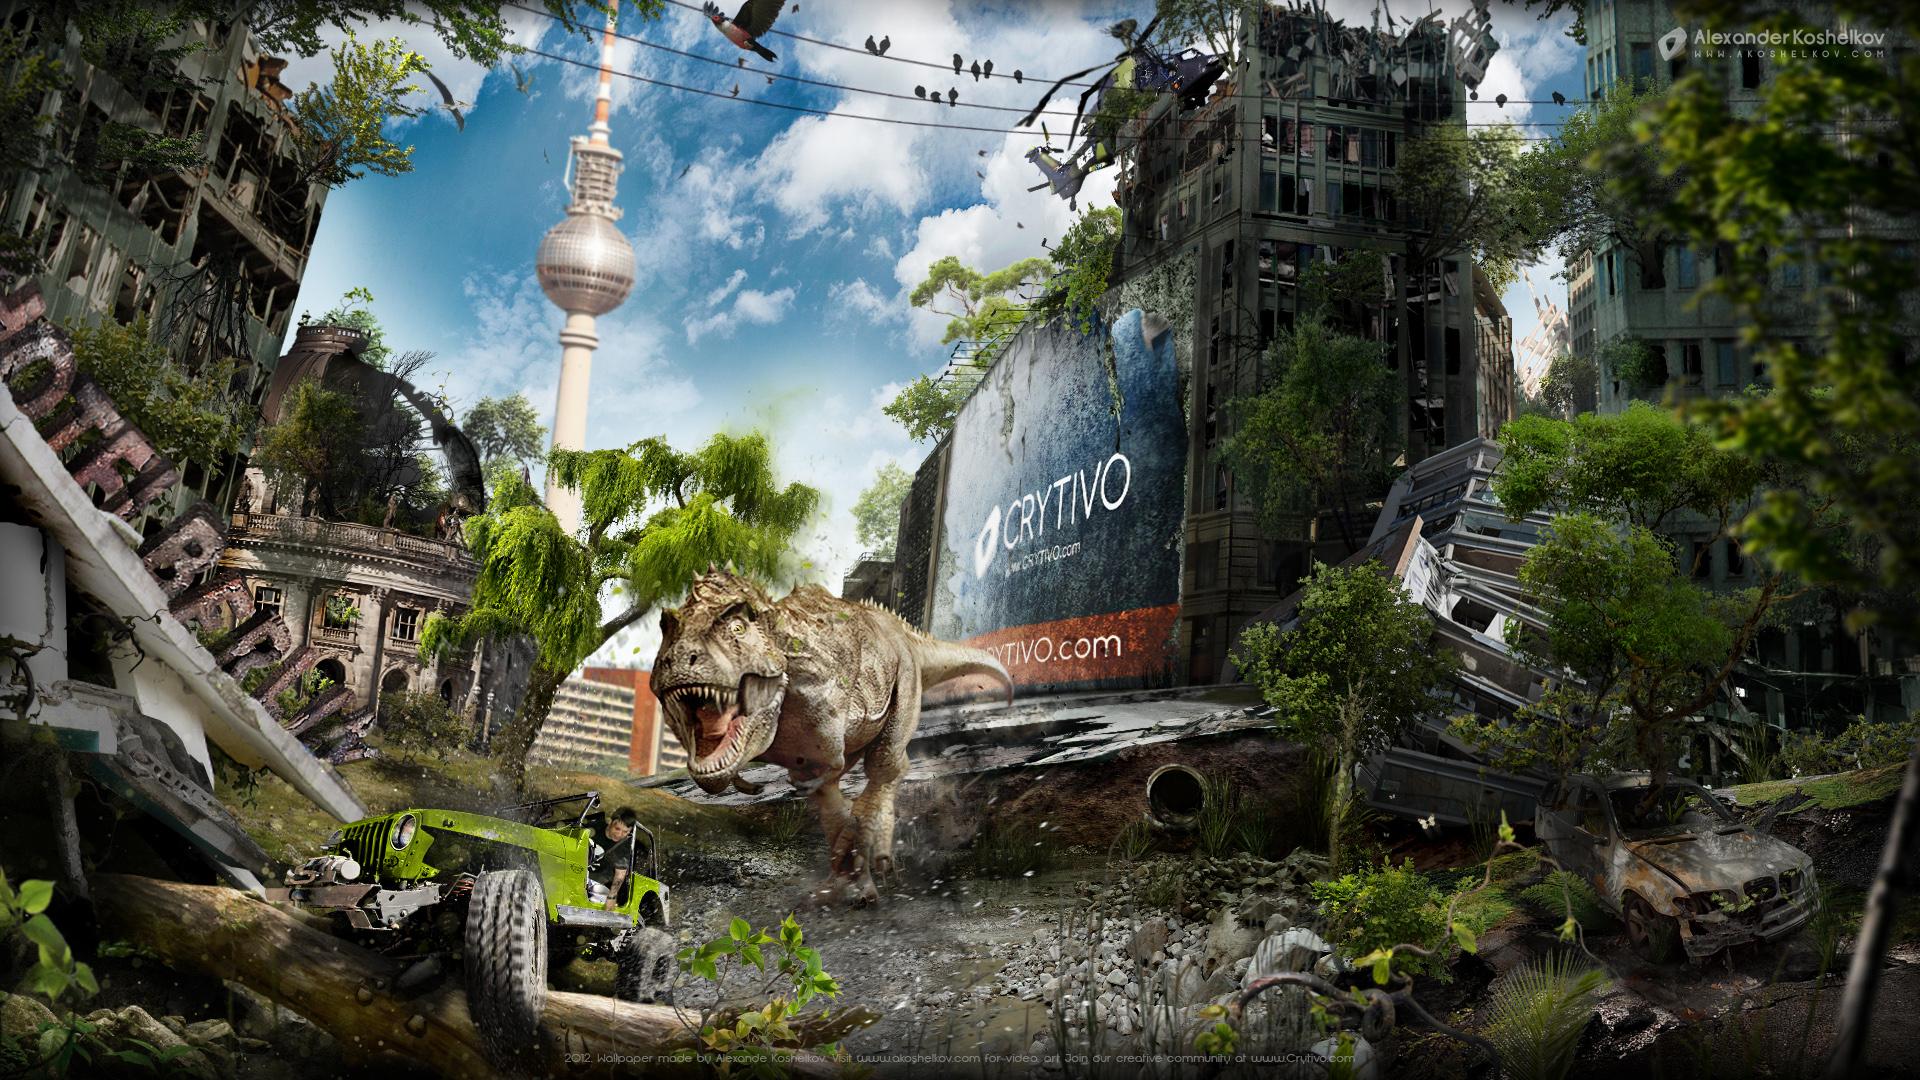 Welcome To Berlin by Koshelkov